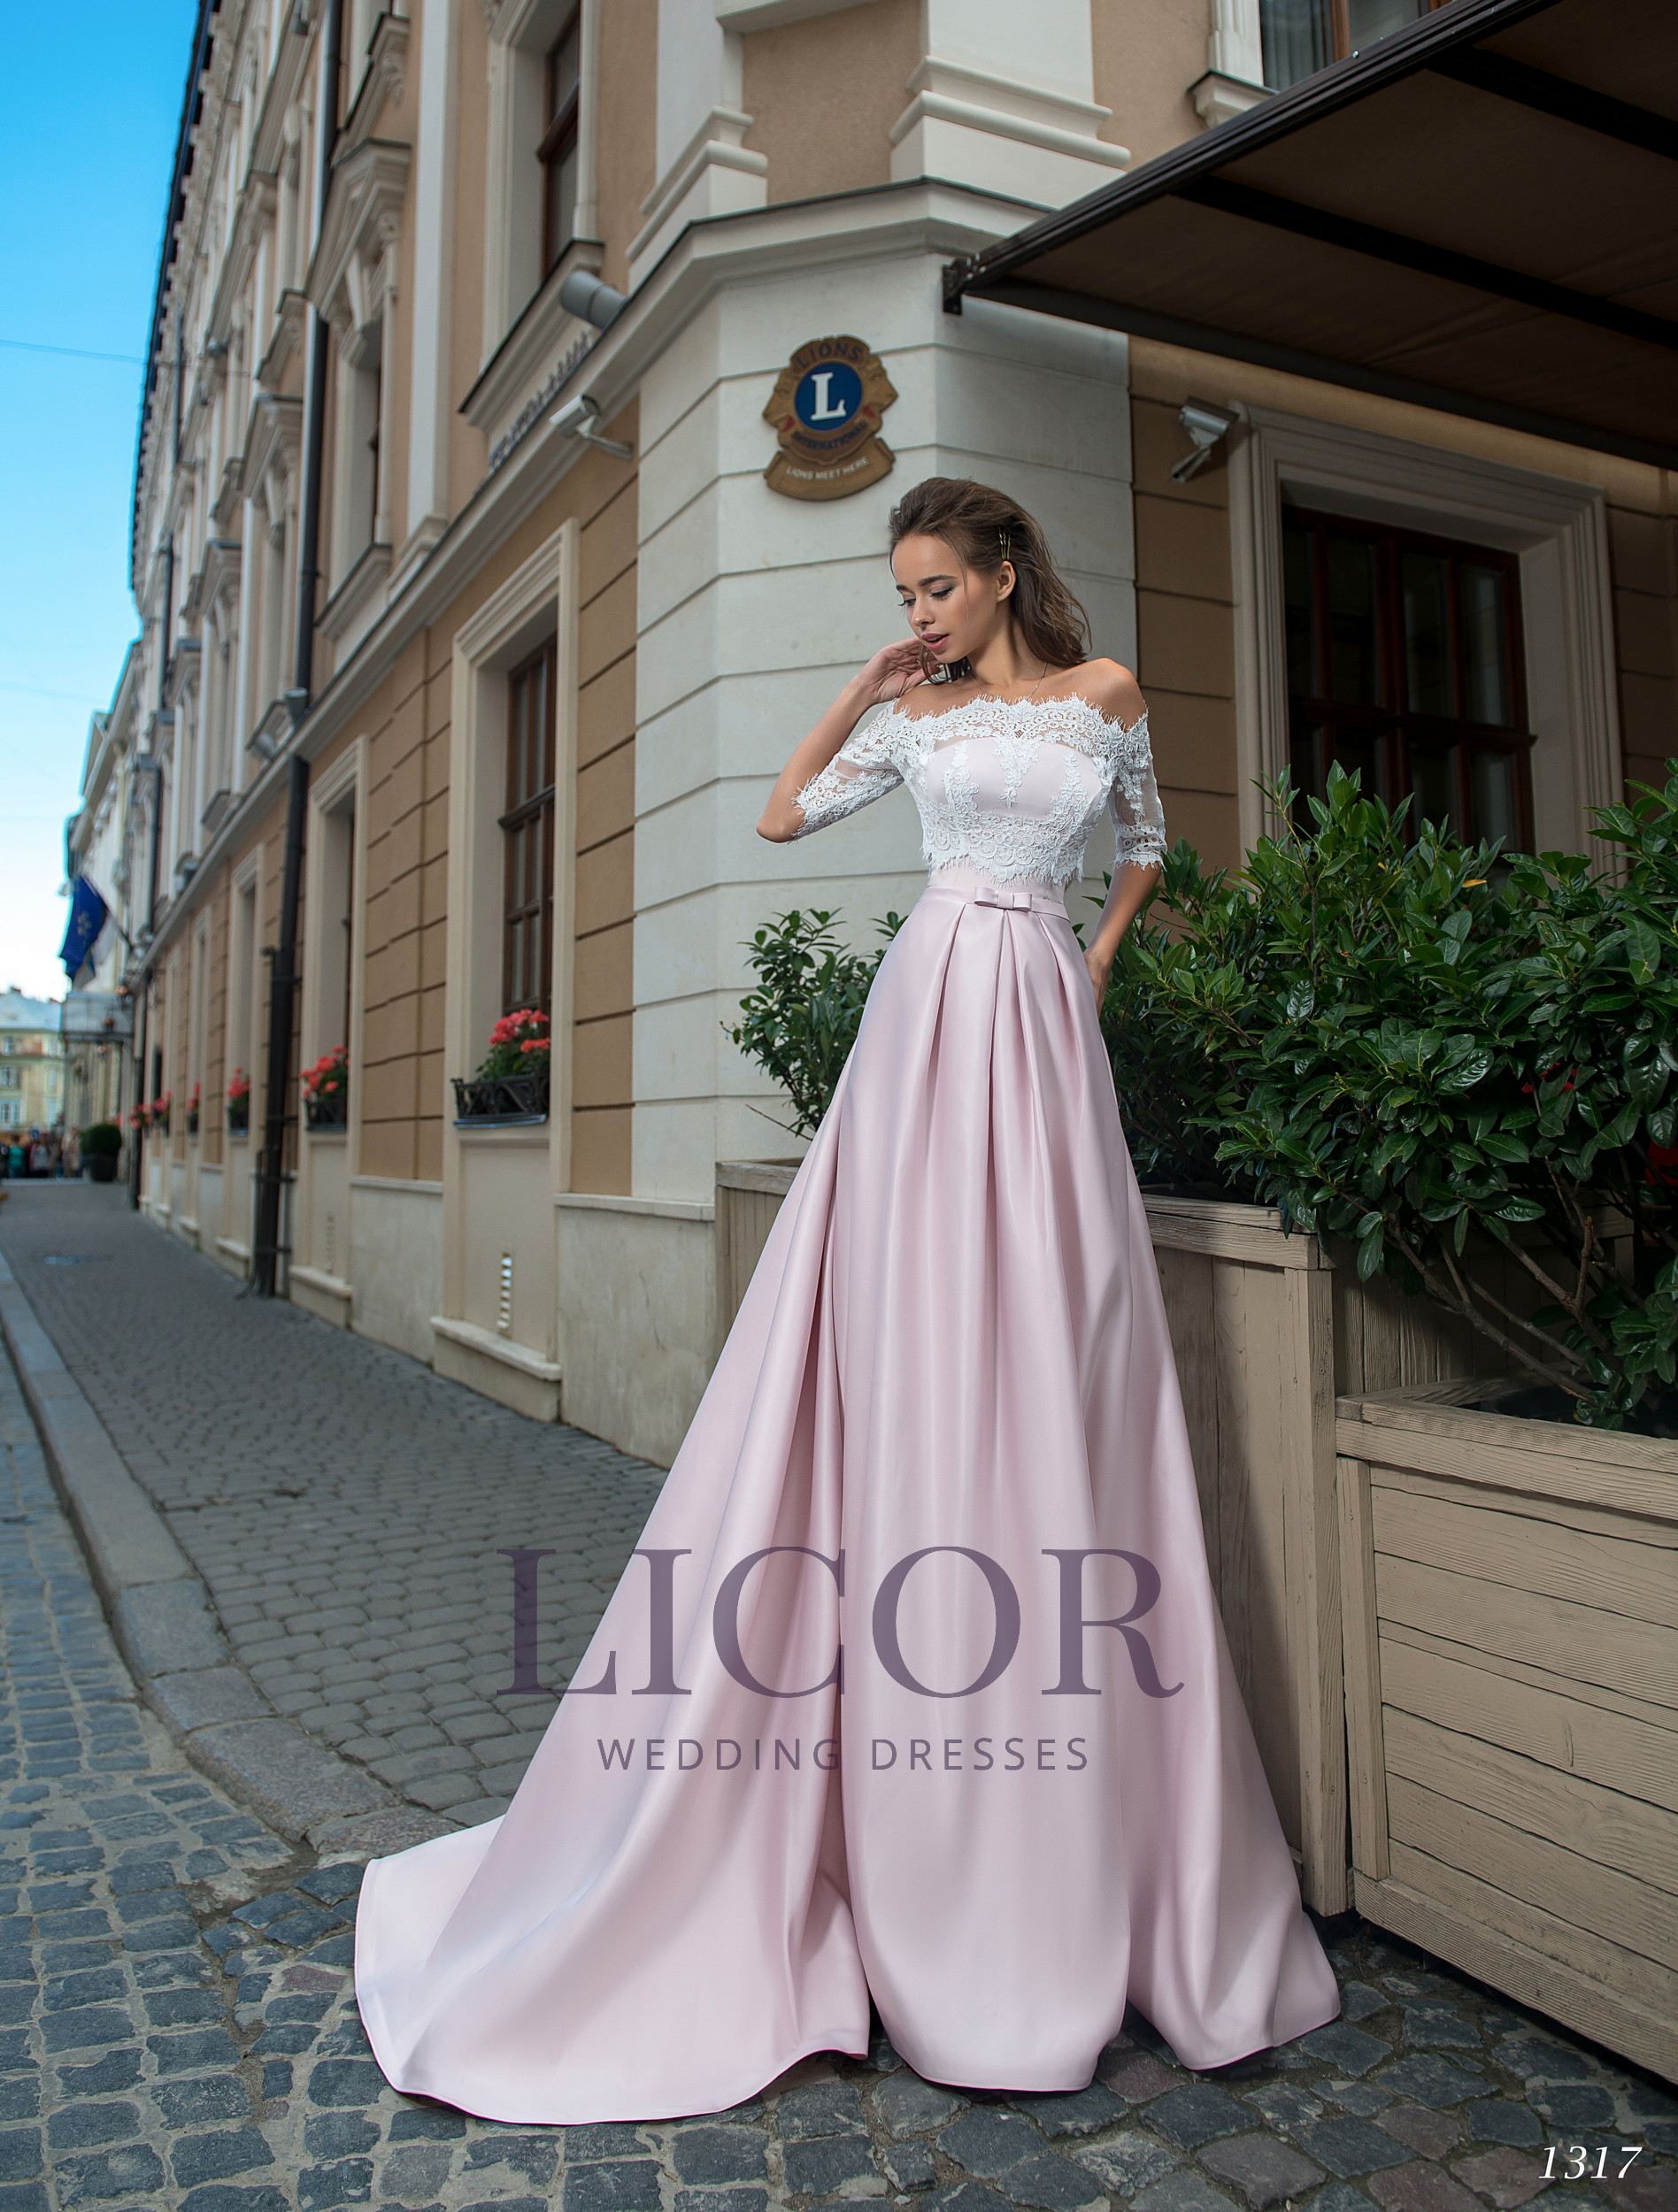 https://licor.com.ua/images/stories/virtuemart/product/1317(1).jpg